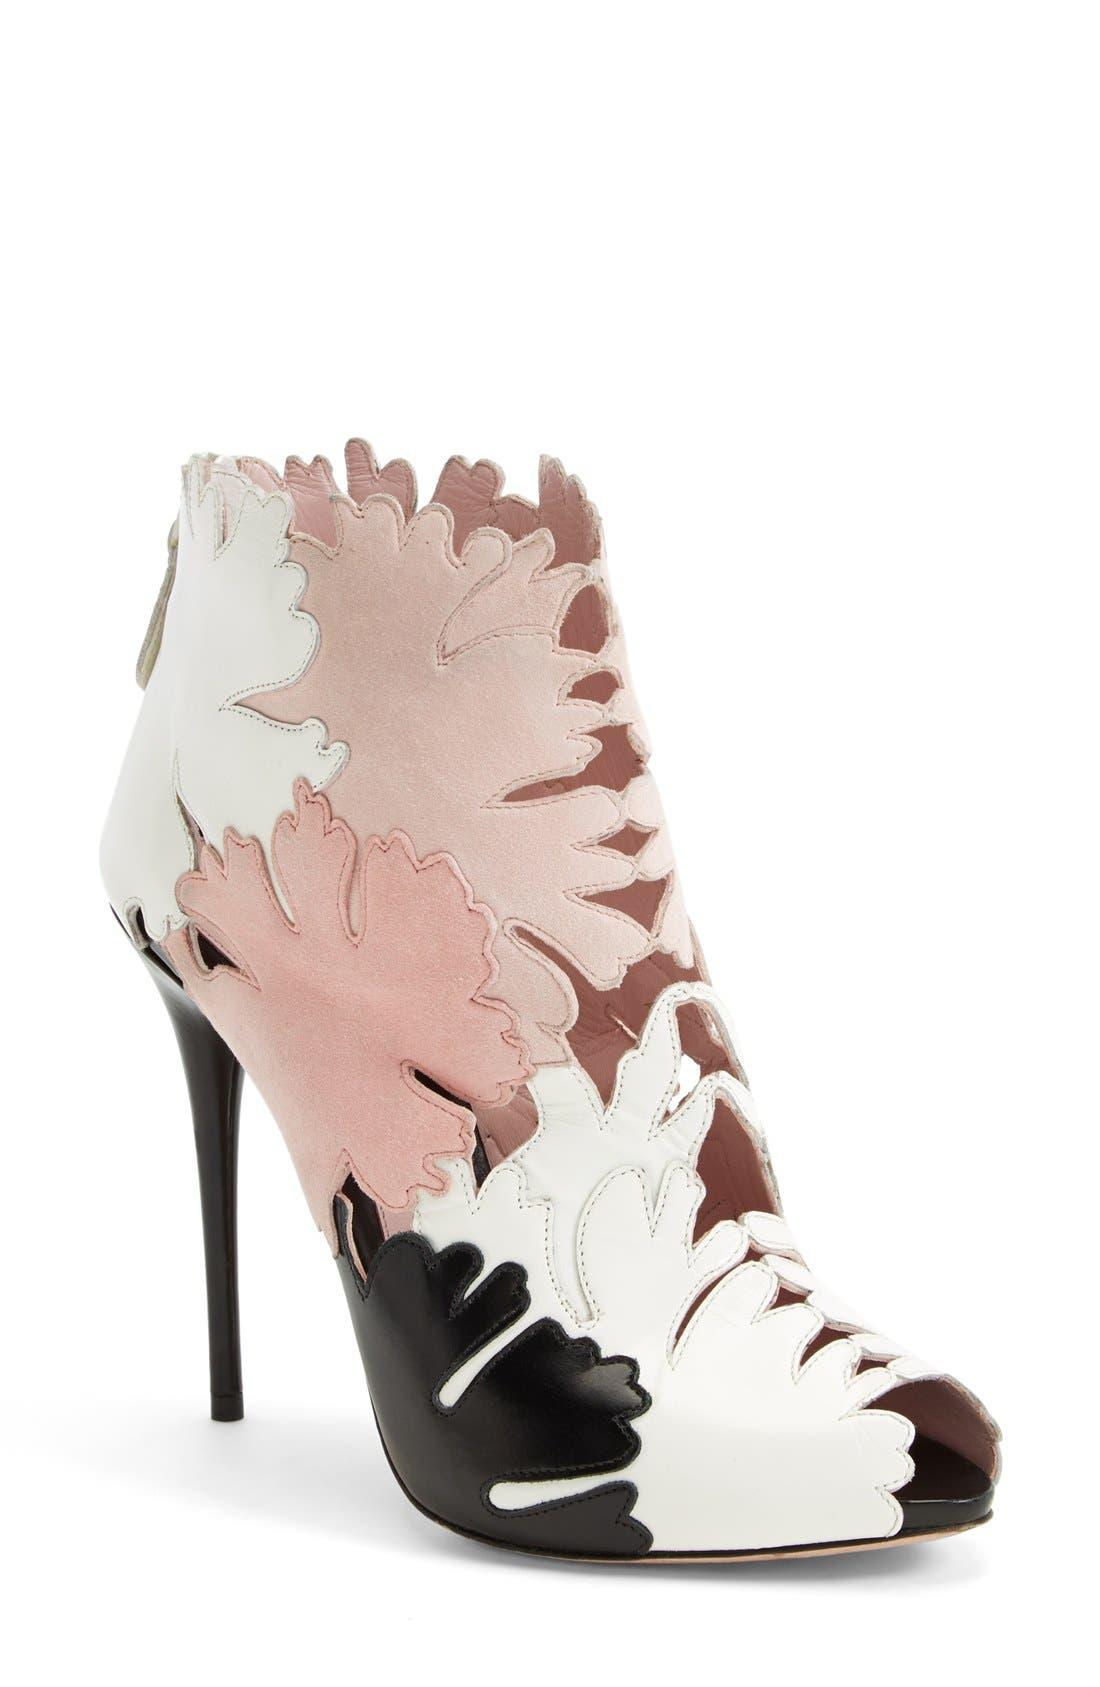 Main Image - Alexander McQueen 'Kimono' Cutout Leather Bootie (Women)